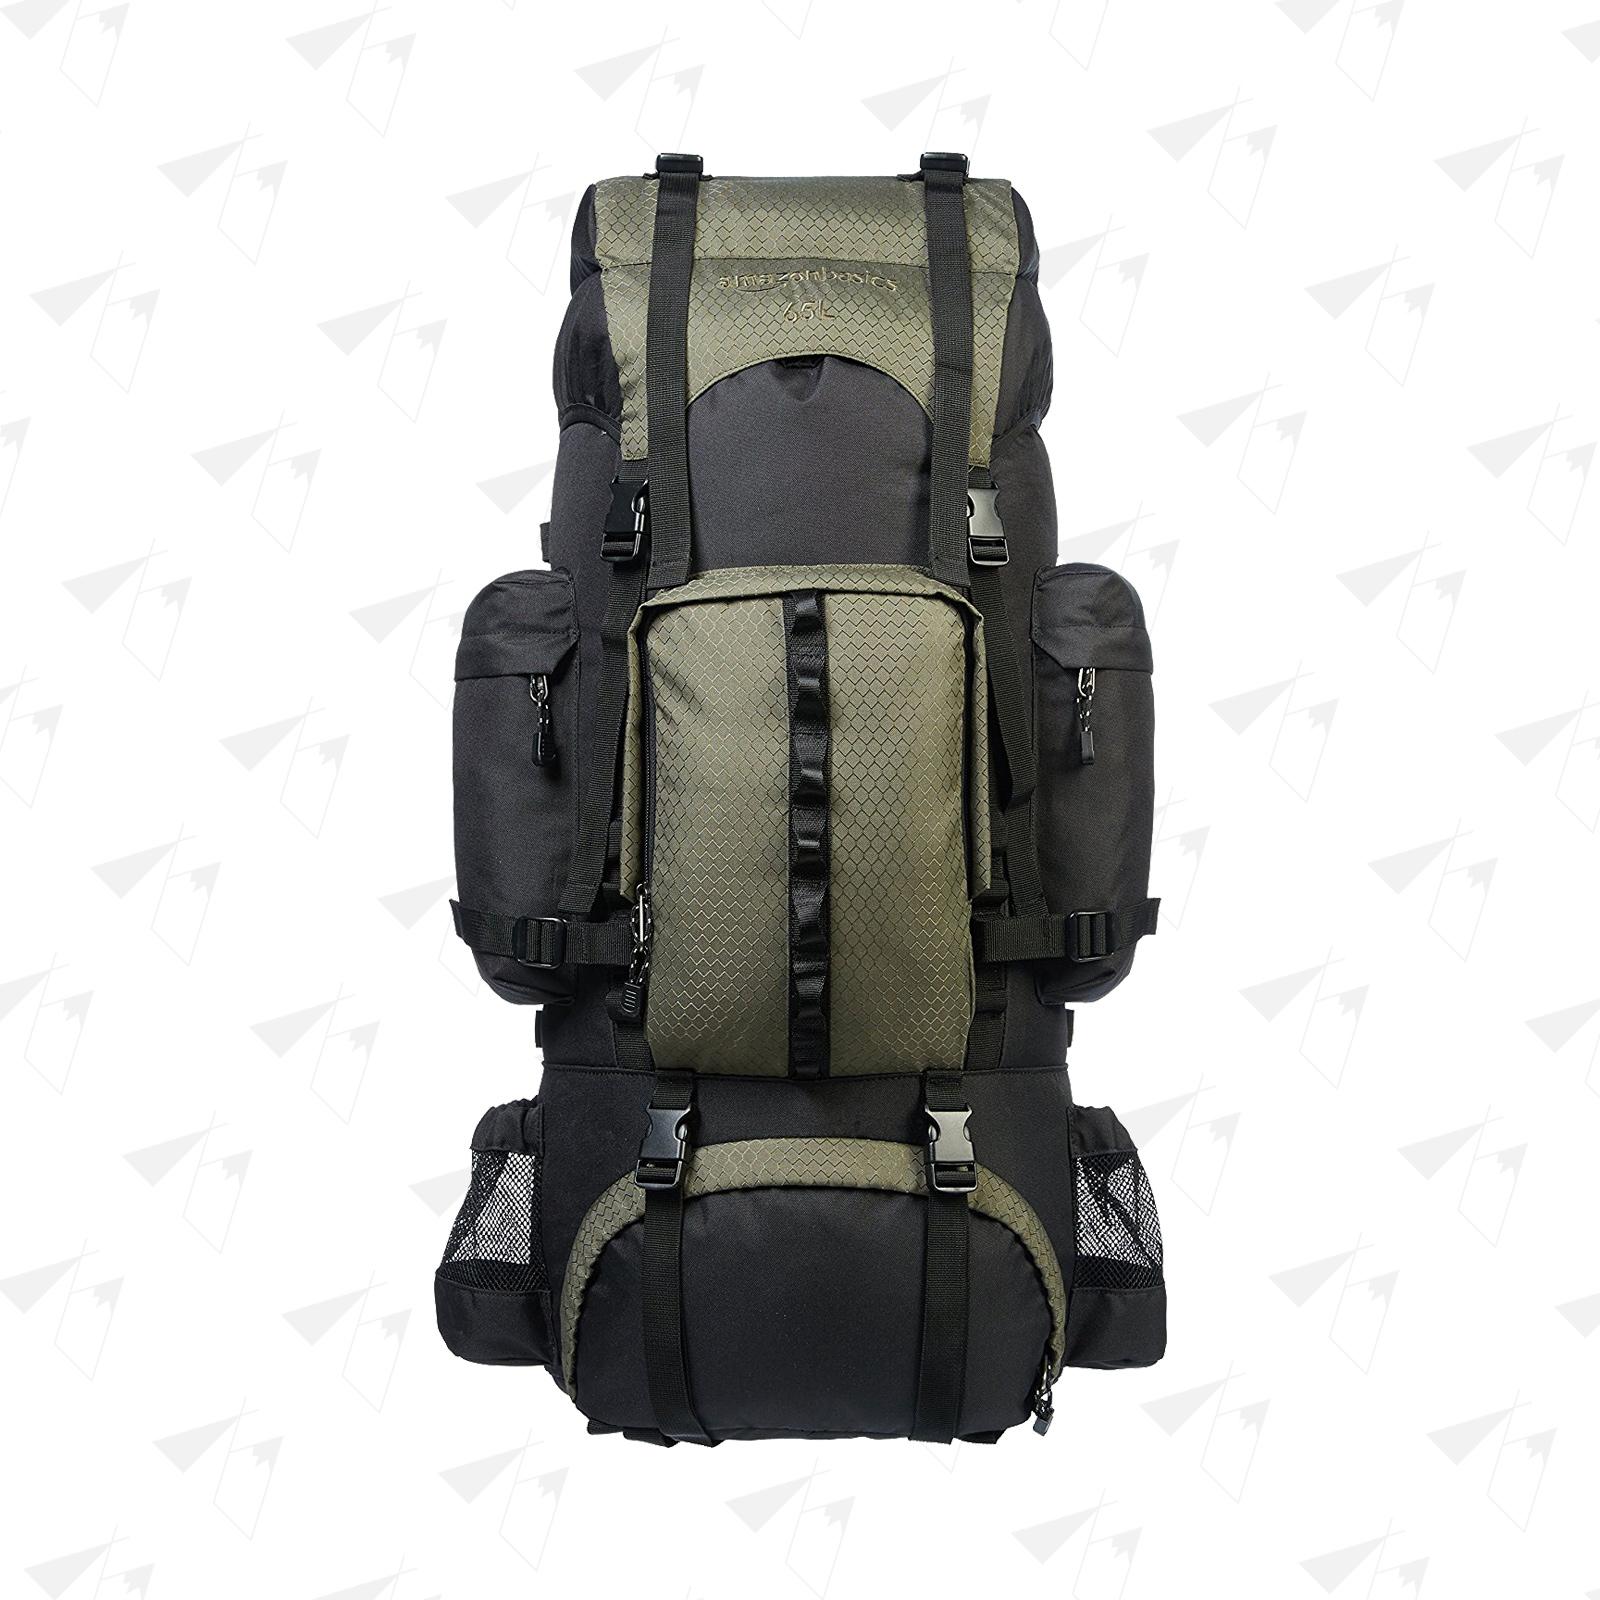 AmazonBasics Internal Frame Backpacking Bag | $41 | Amazon